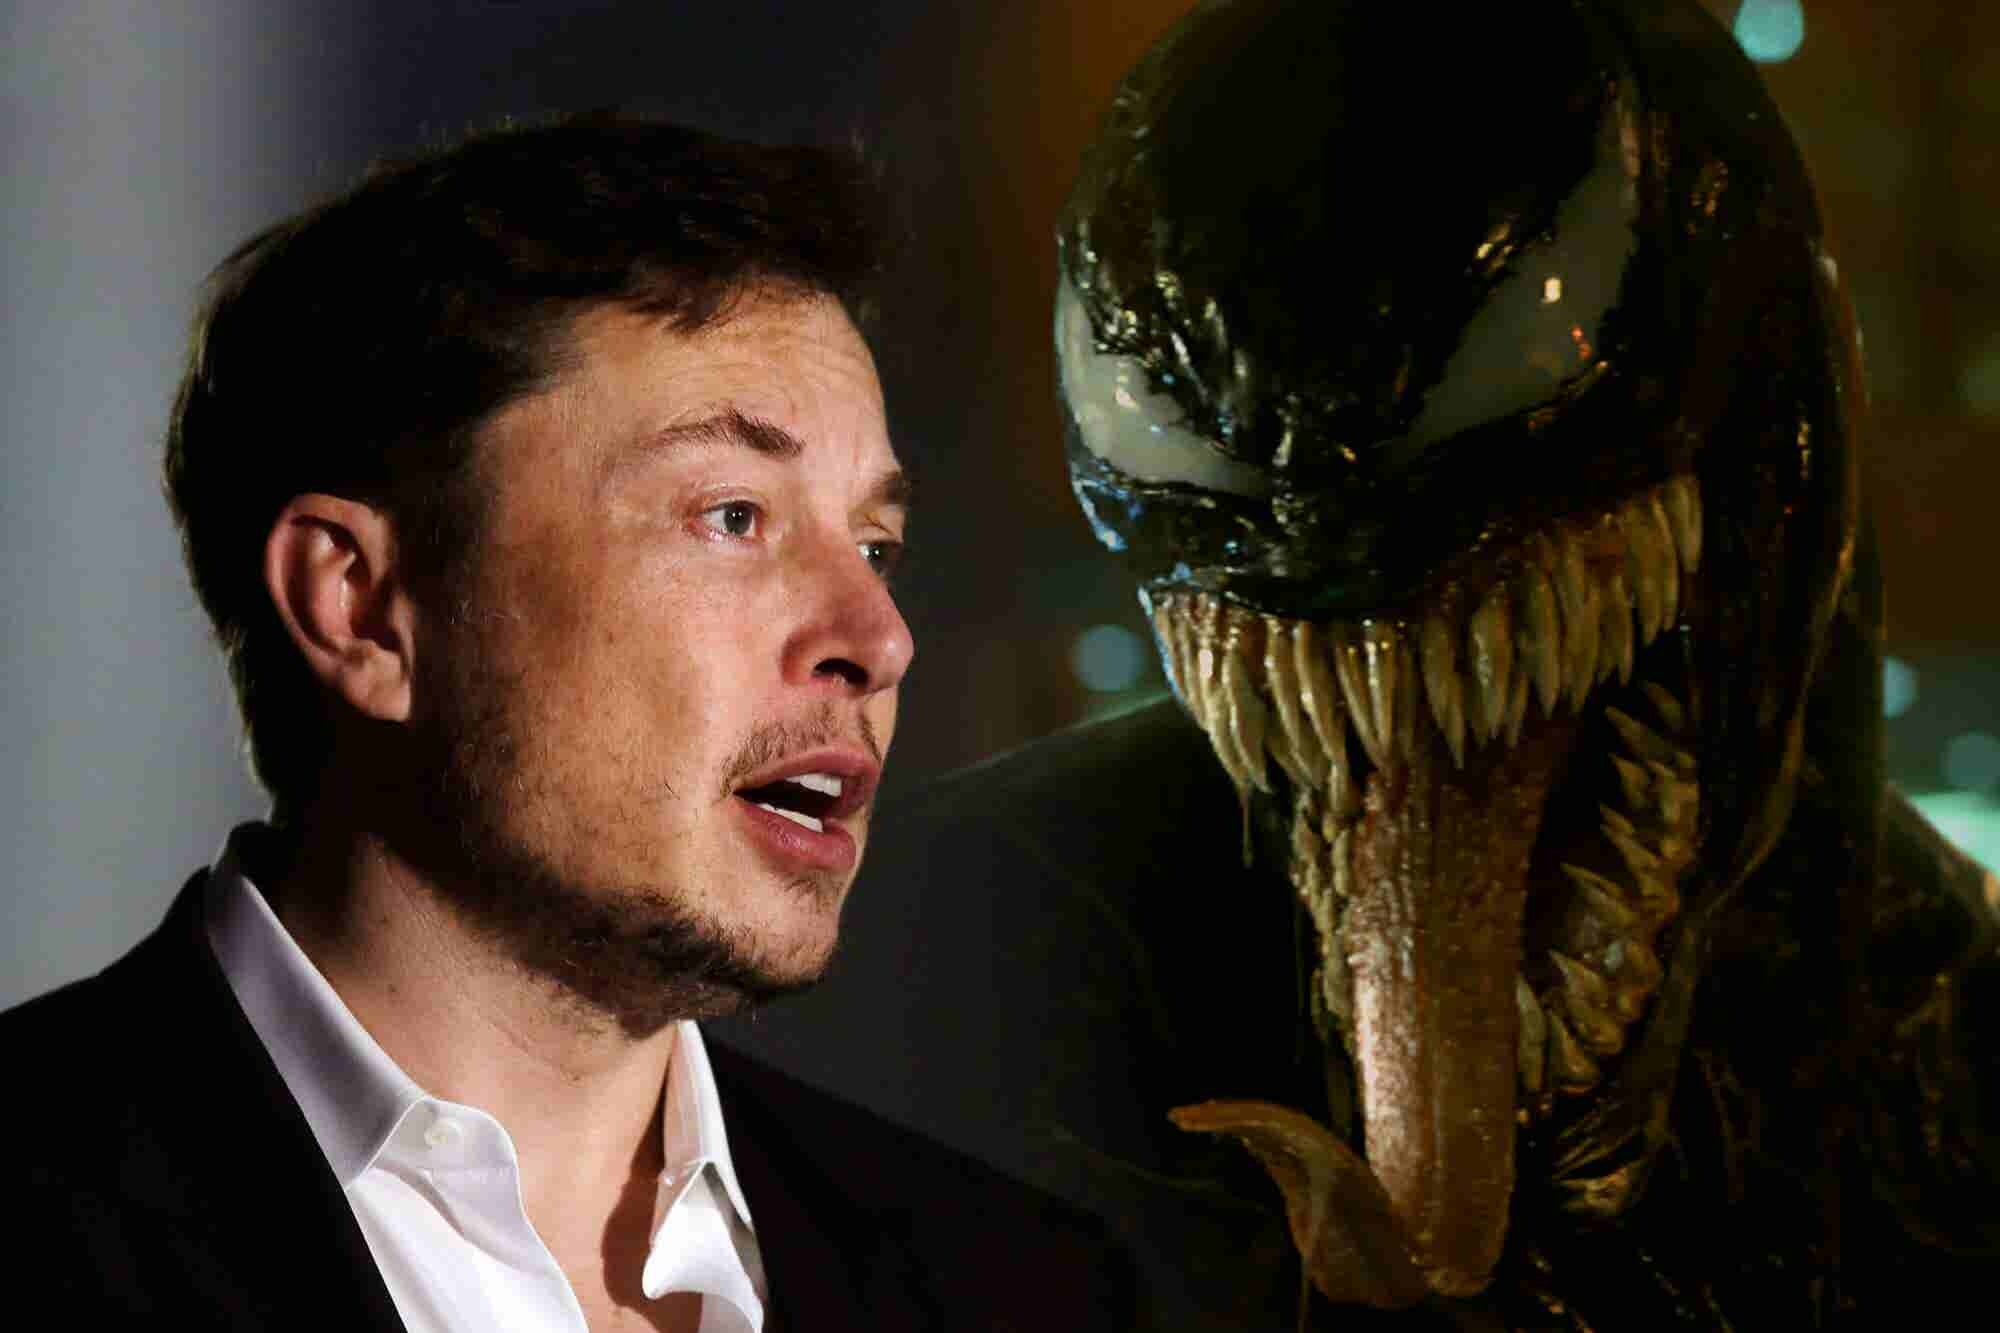 Elon Musk Is Basically the Villain of the 'Venom' Movie